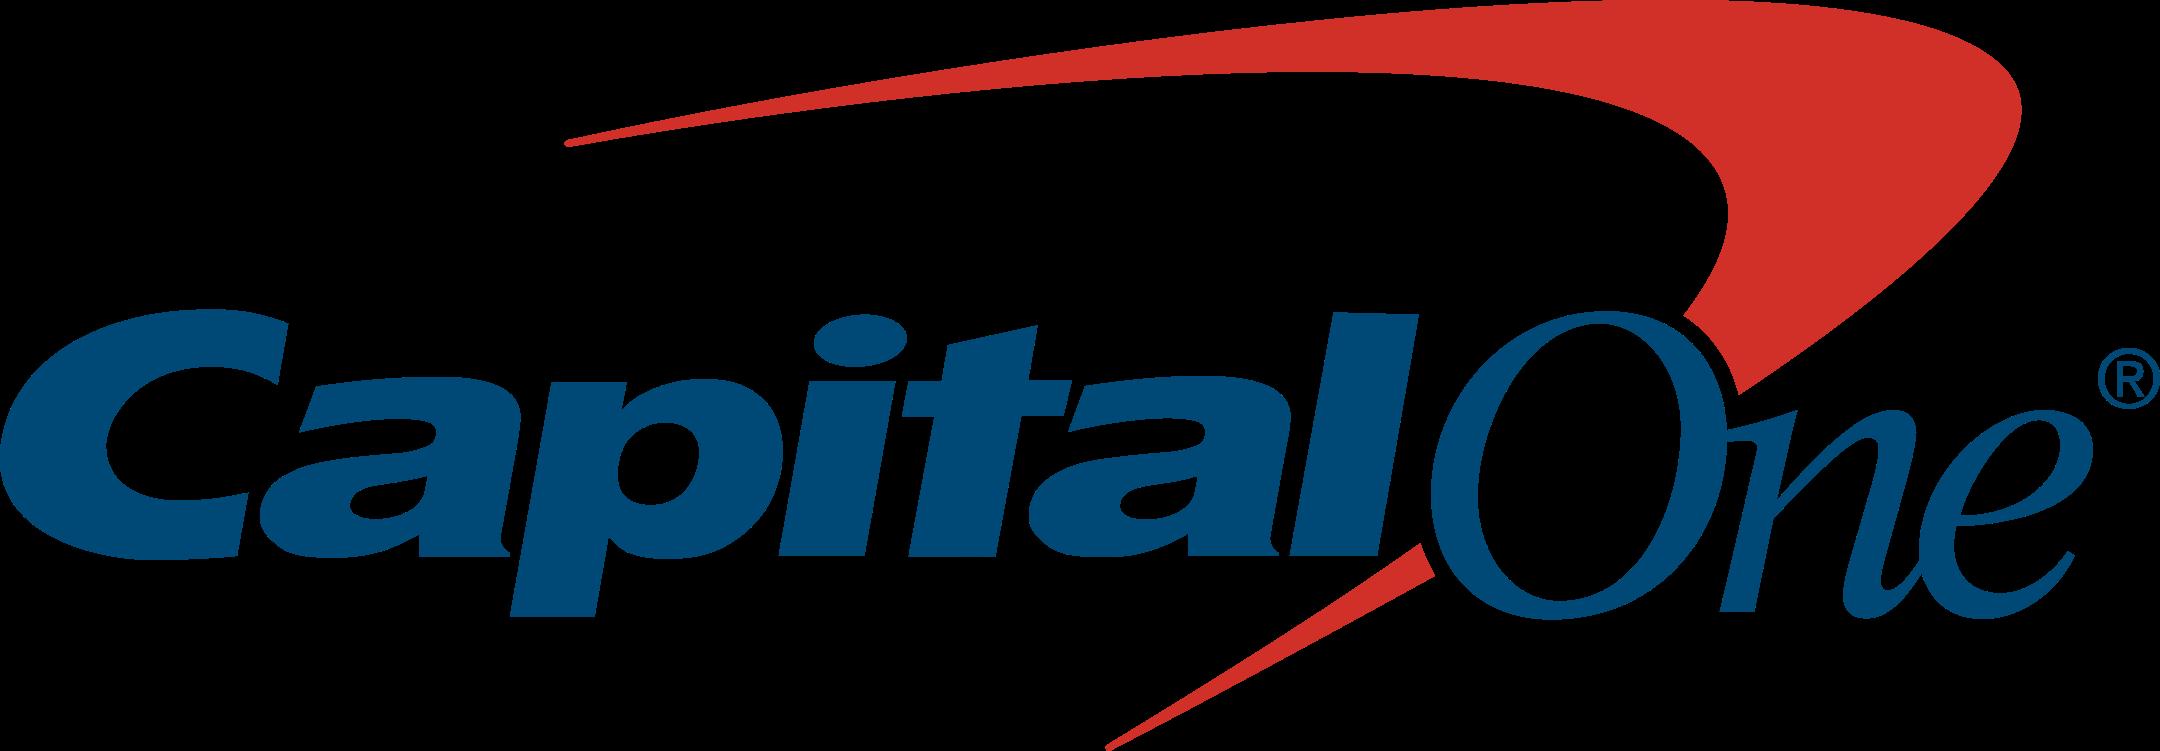 capital one logo 1 - Capital One Logo